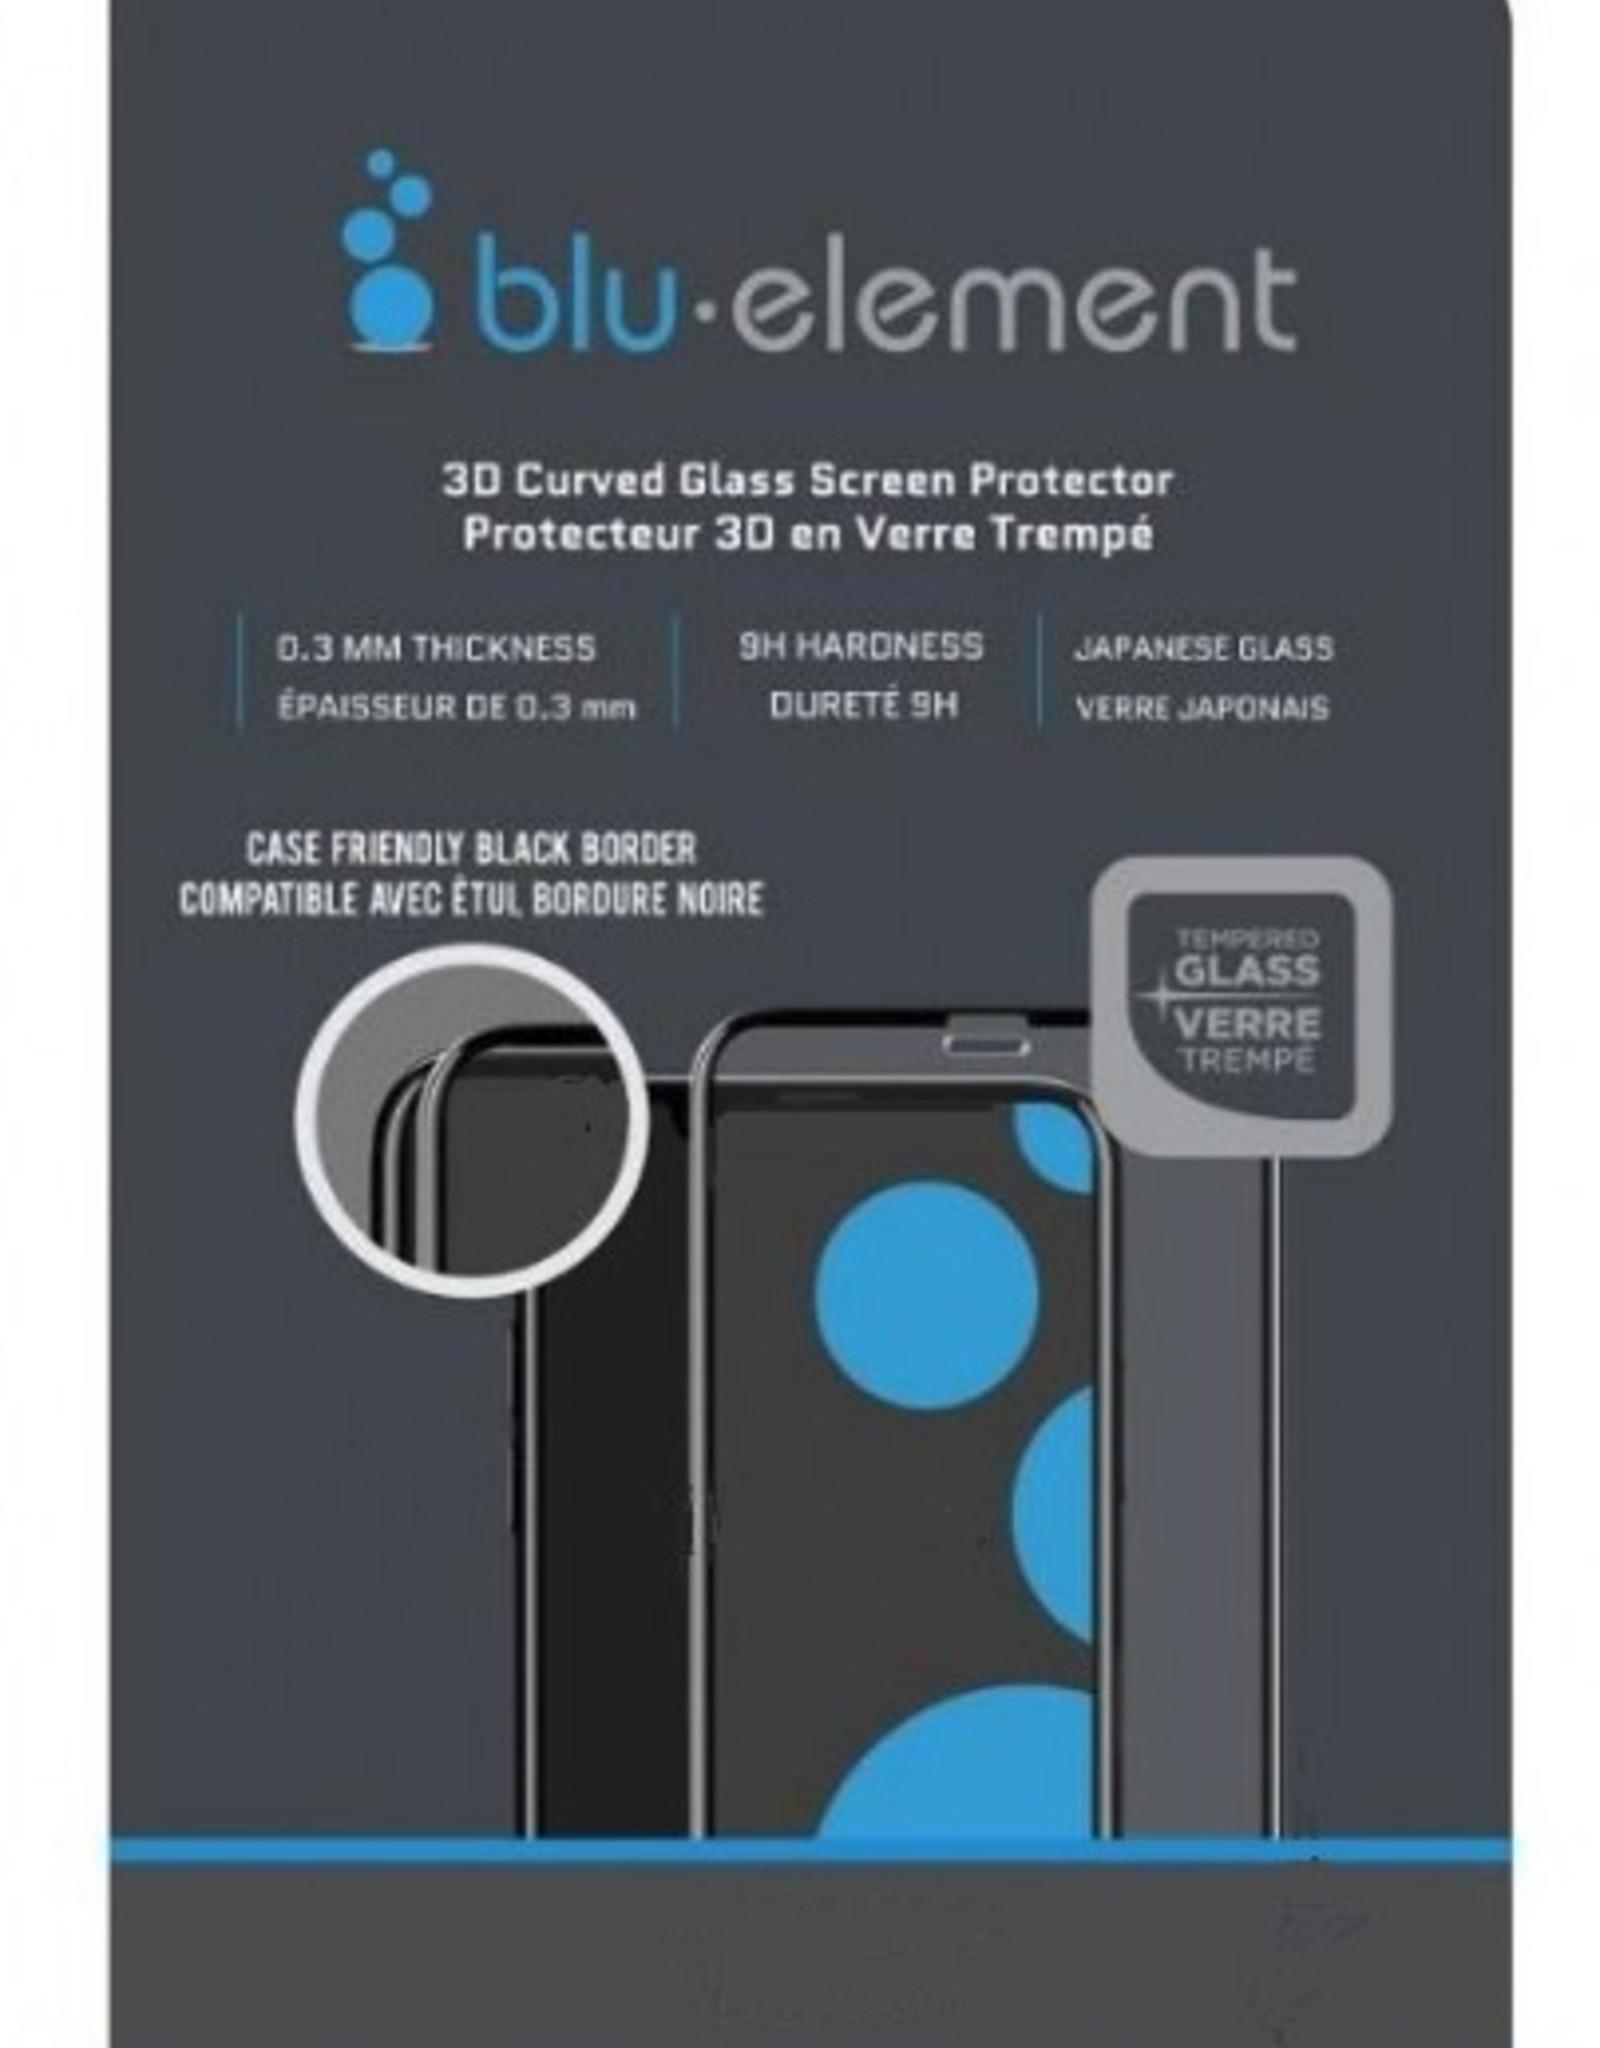 Blu Element /// Blu Element   Google Pixel 2 XL   3D Curved Glass Screen Protector - 118-1893